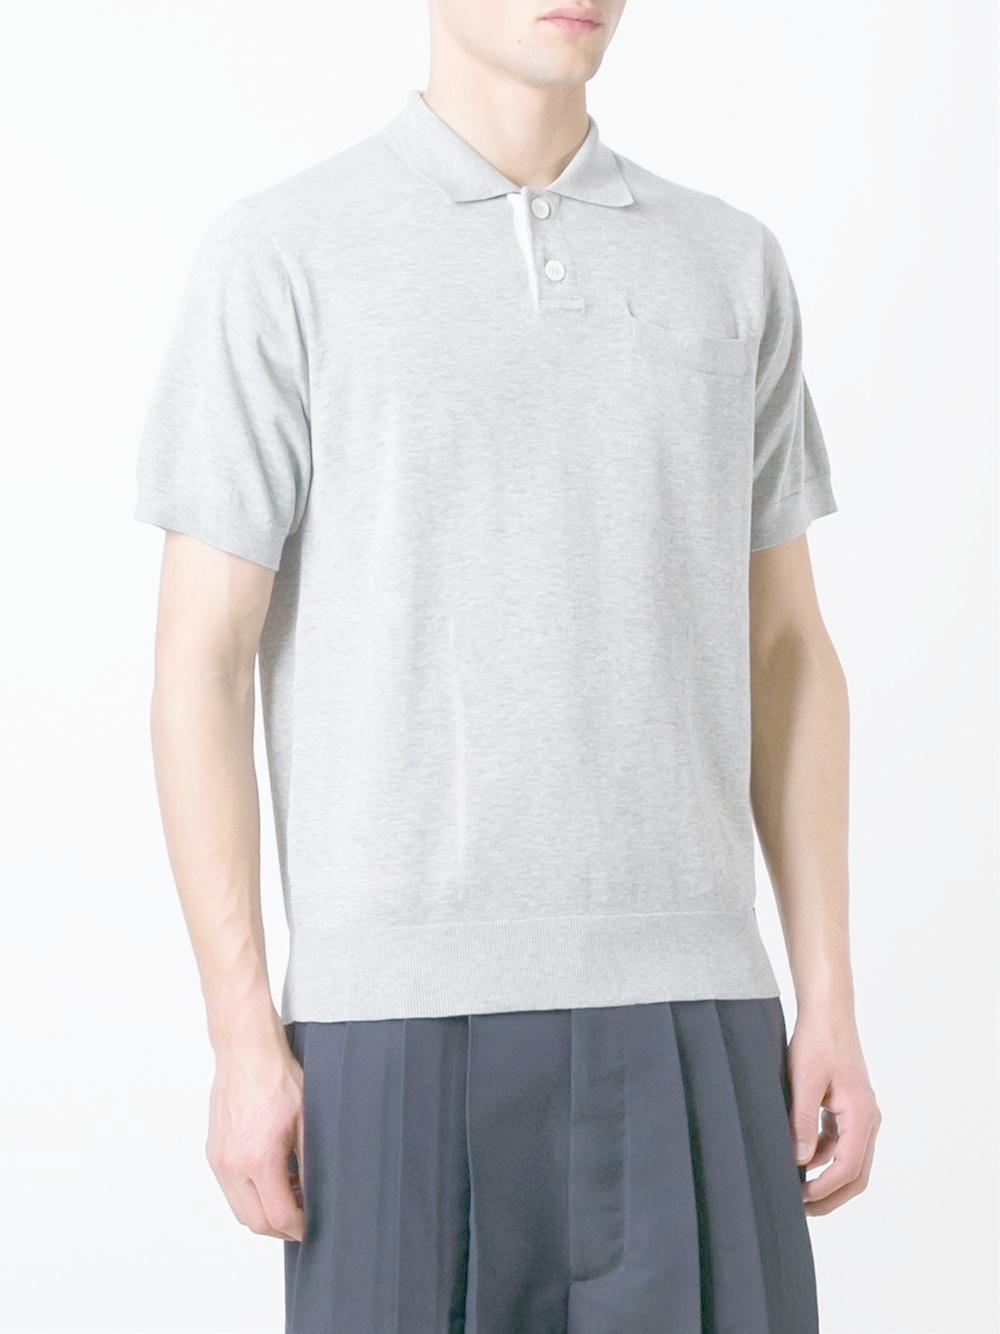 Sacai chest pocket polo shirt in gray for men lyst for Men s polo shirts with chest pocket